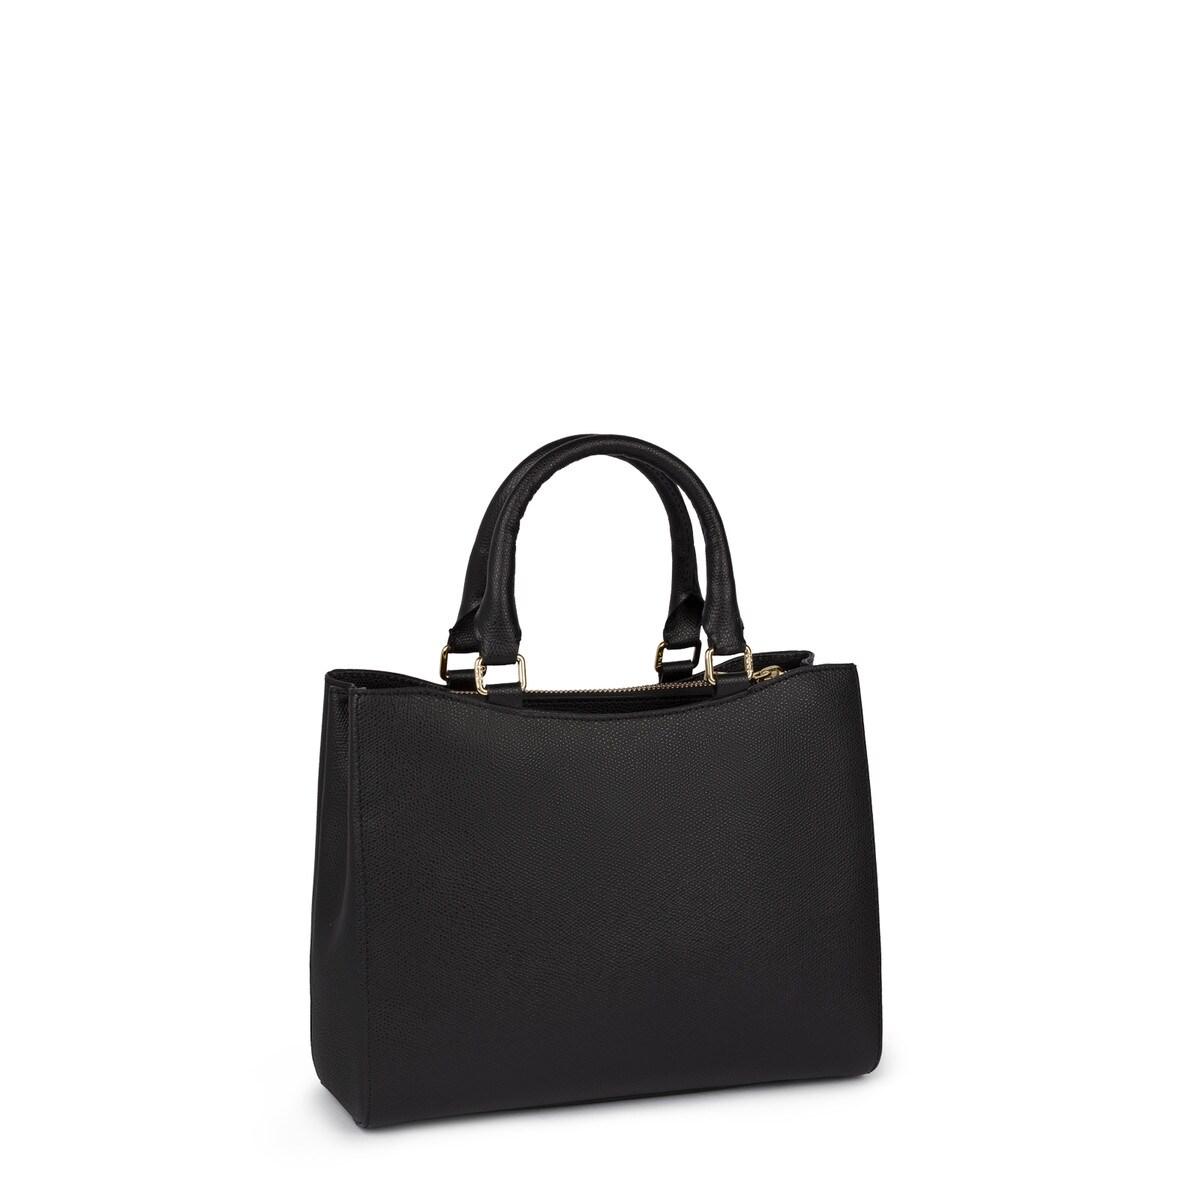 8bfbf6dba14 Μικρή τσάντα City Odalis από Δέρμα σε μαύρο χρώμα - Tous Site Grecia